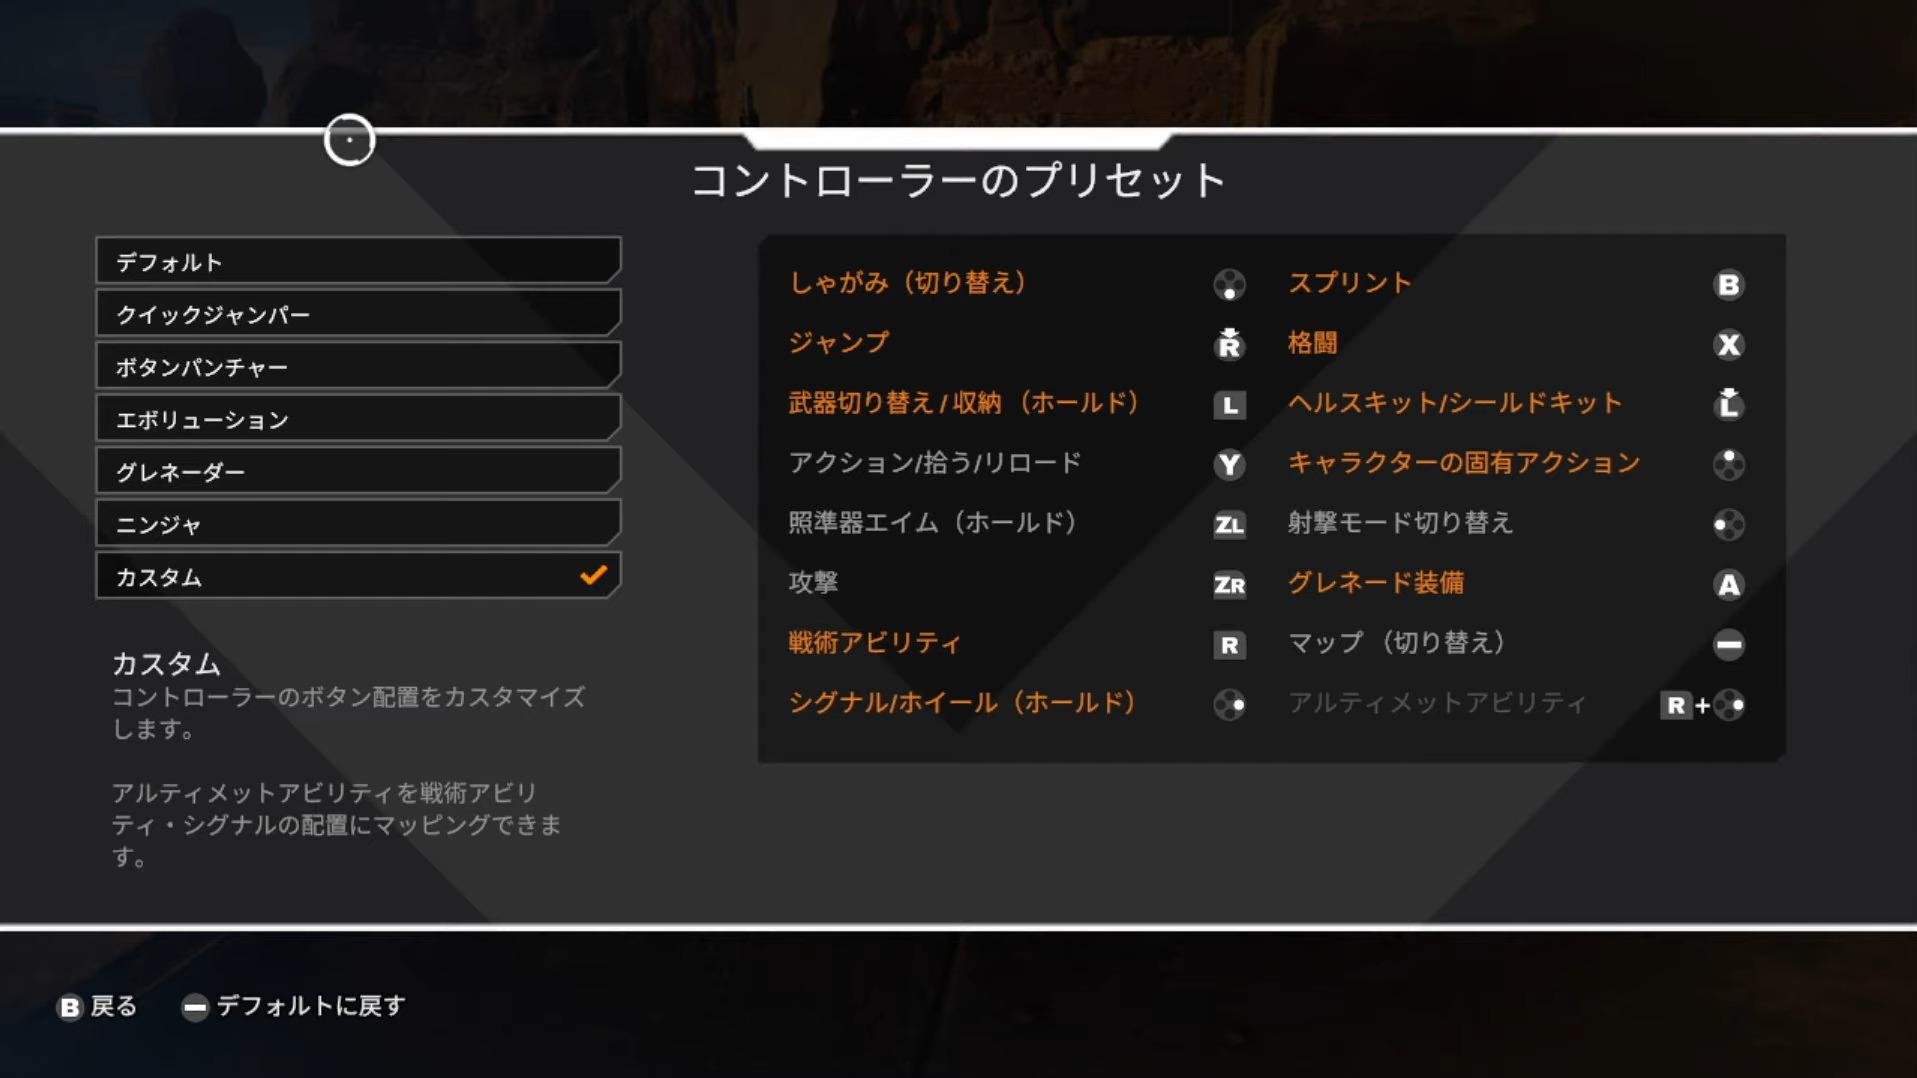 【Apex Legends】ゆうごげーむず 最新のボタン配置設定・感度設定・デバイス まとめ